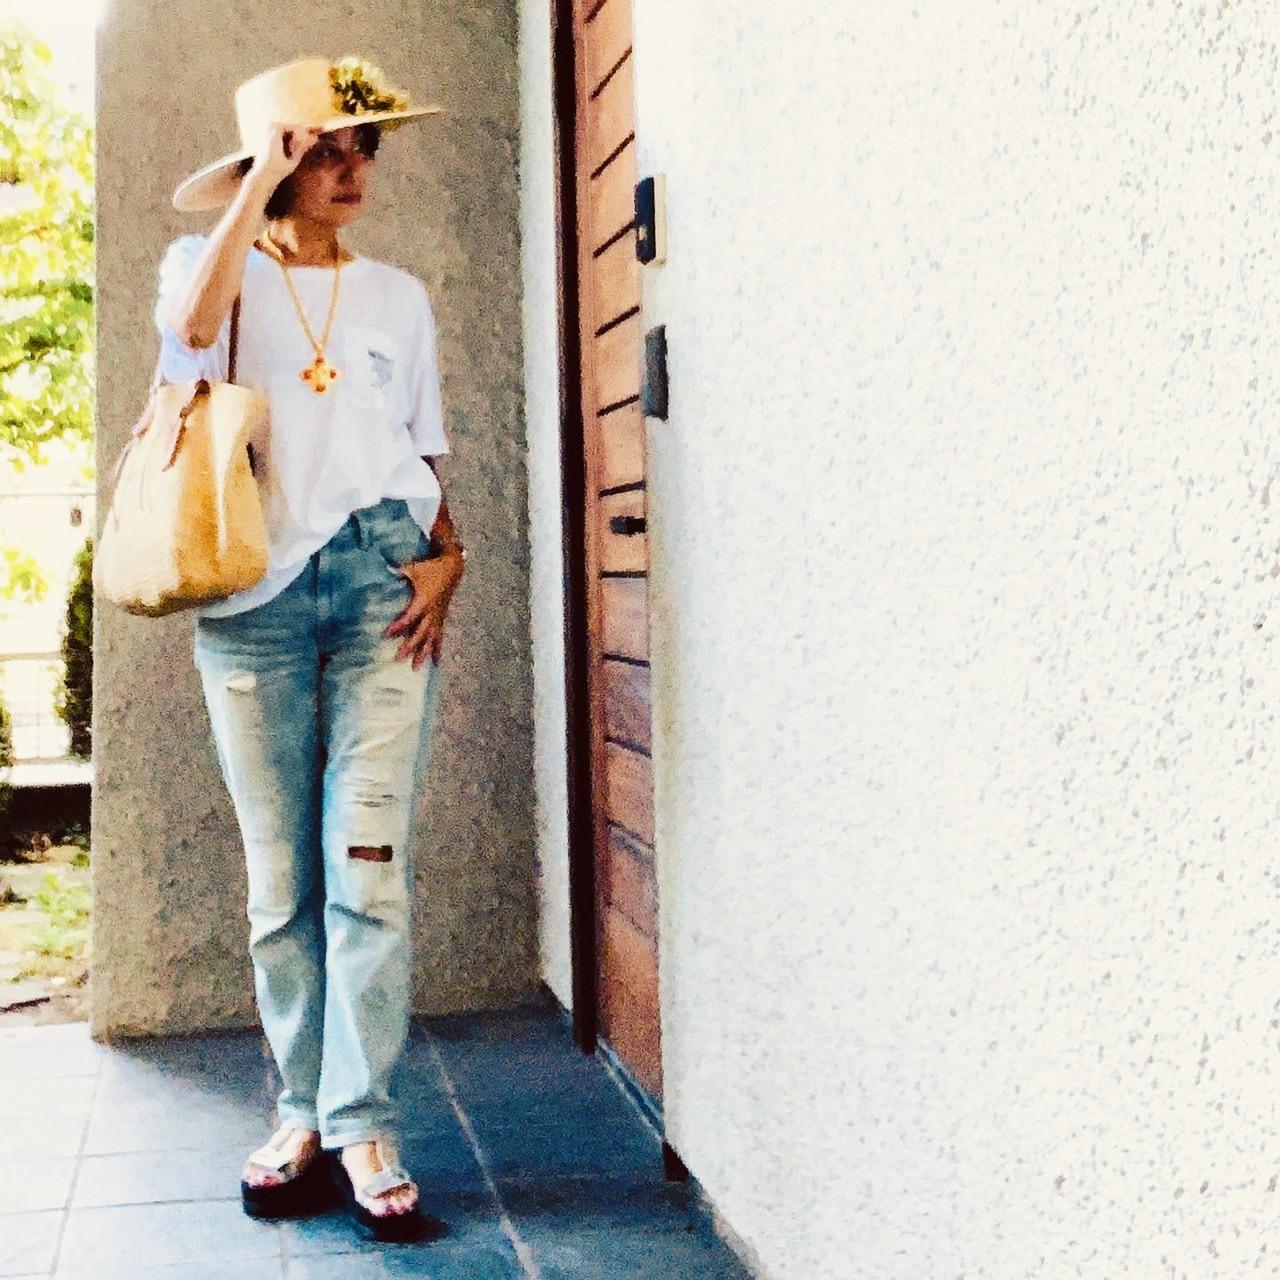 jマダムのお帽子Style♪_1_6-2